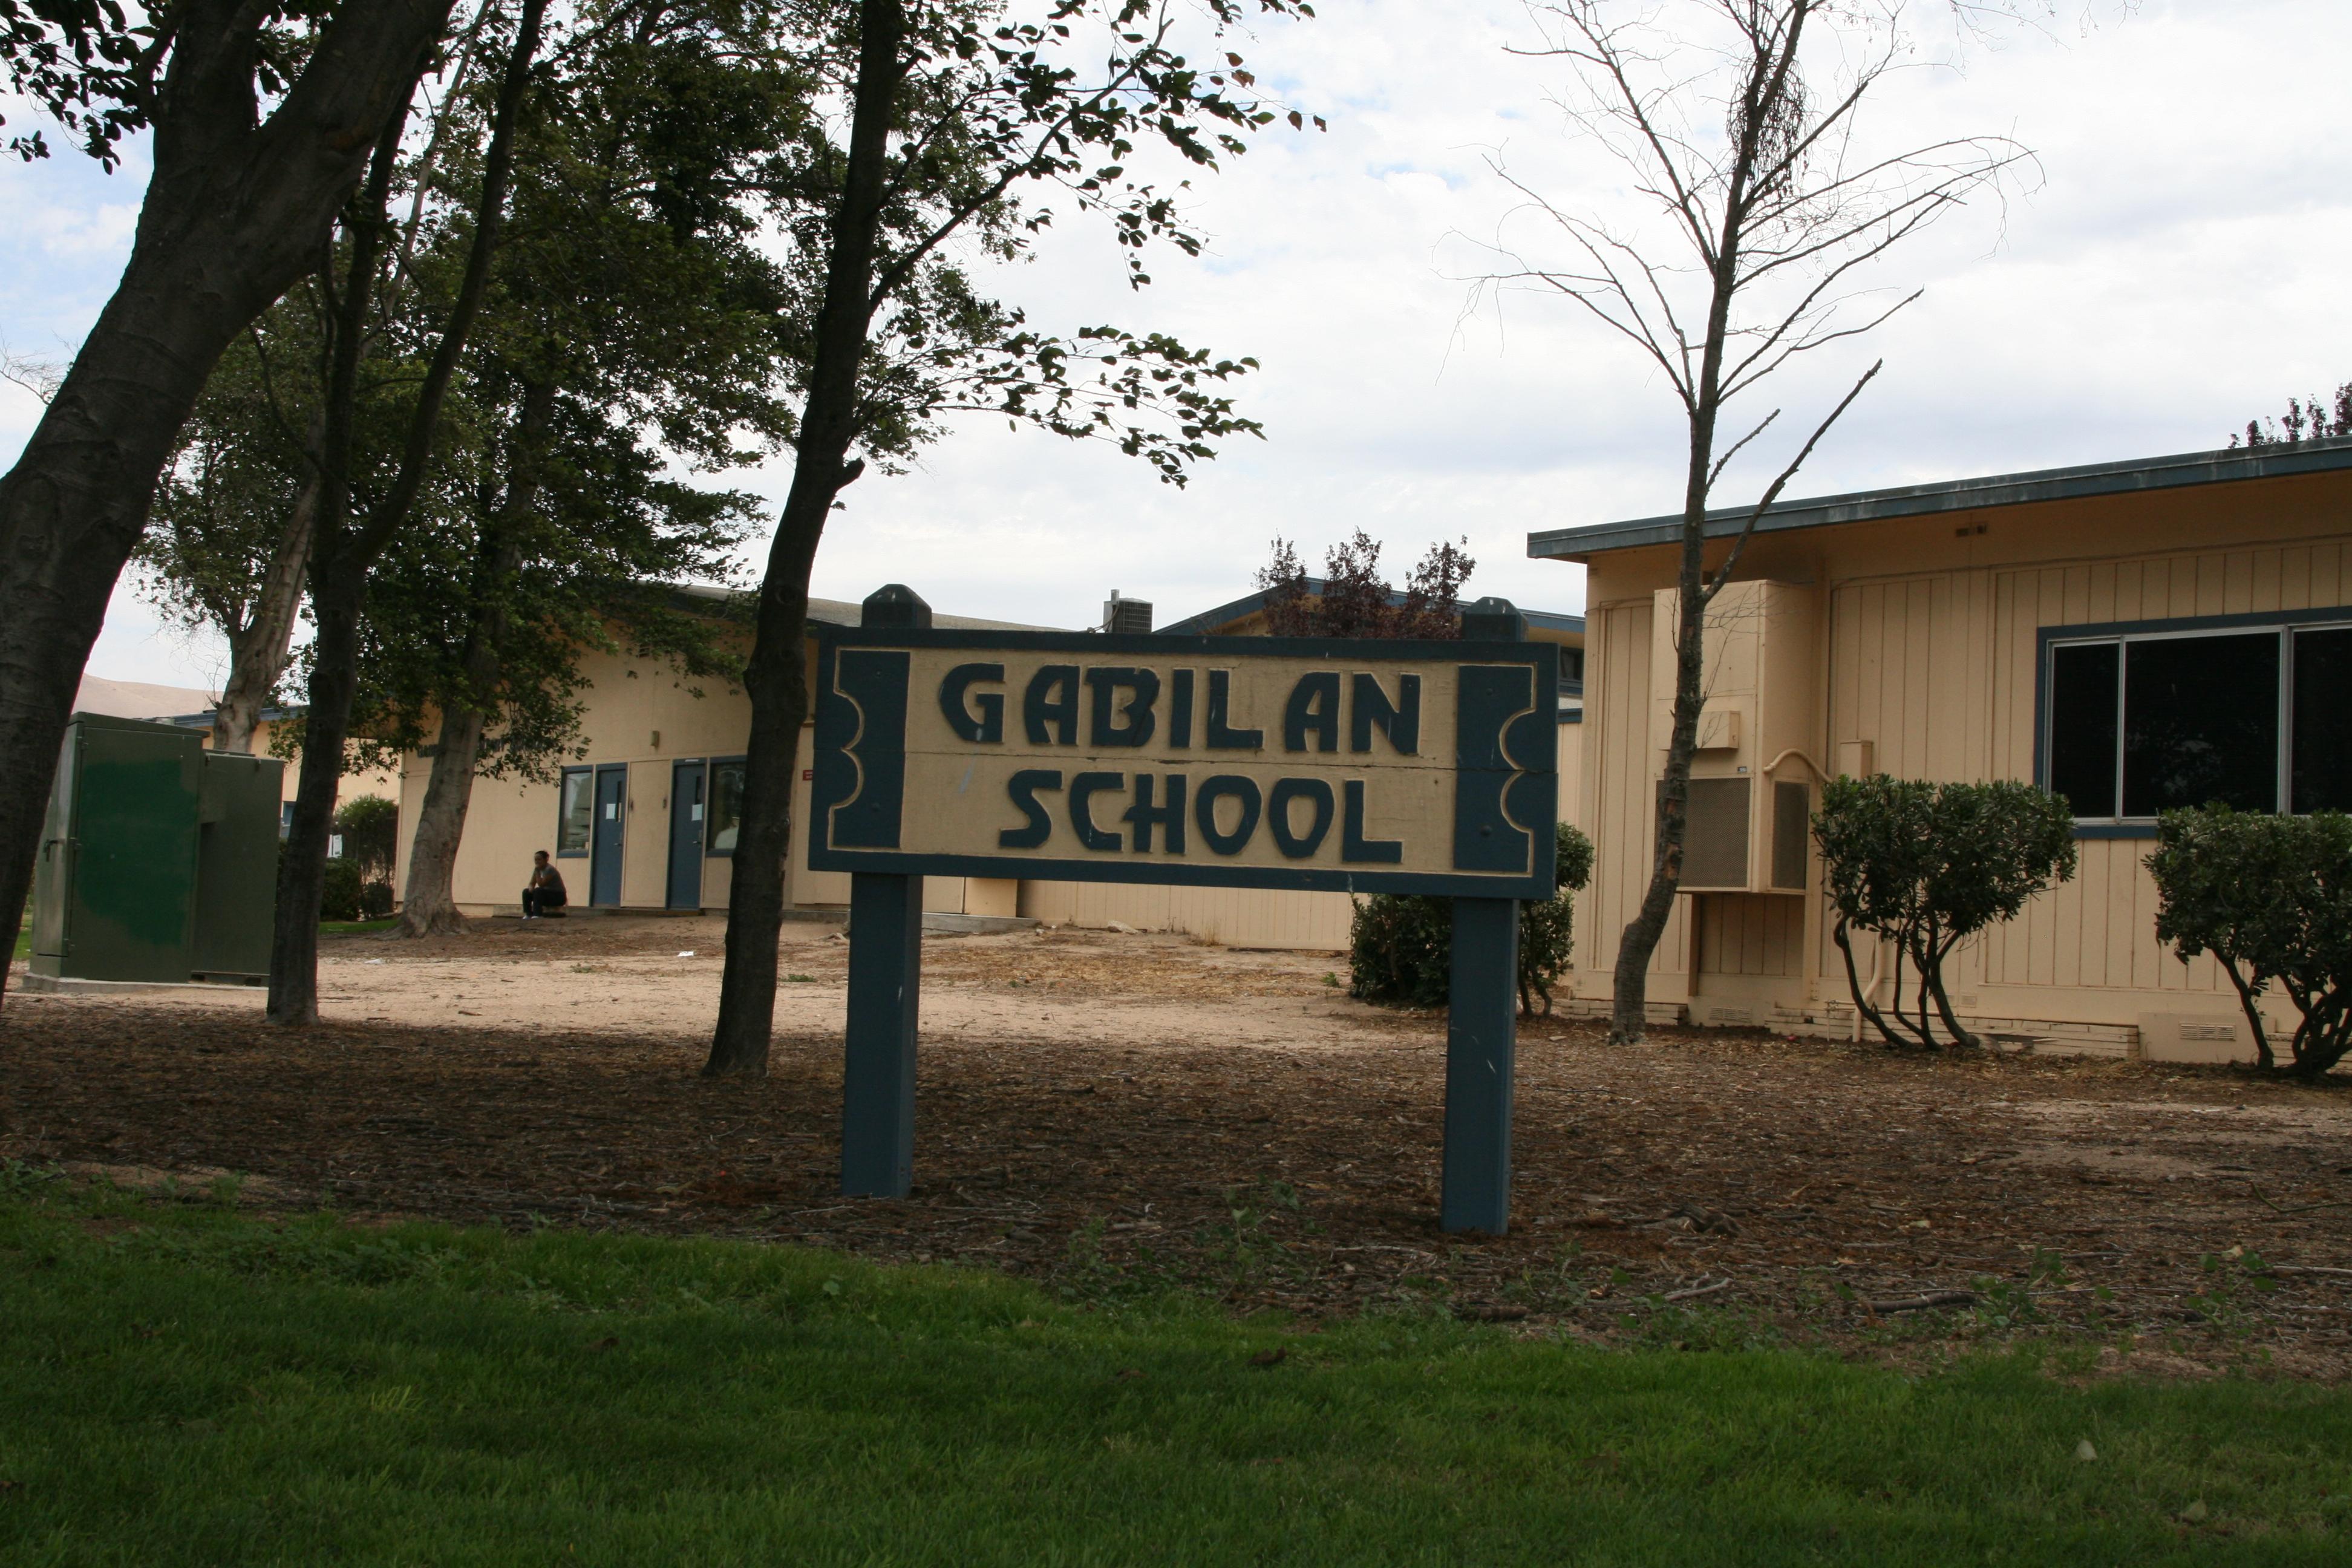 Gabilan Elementary School